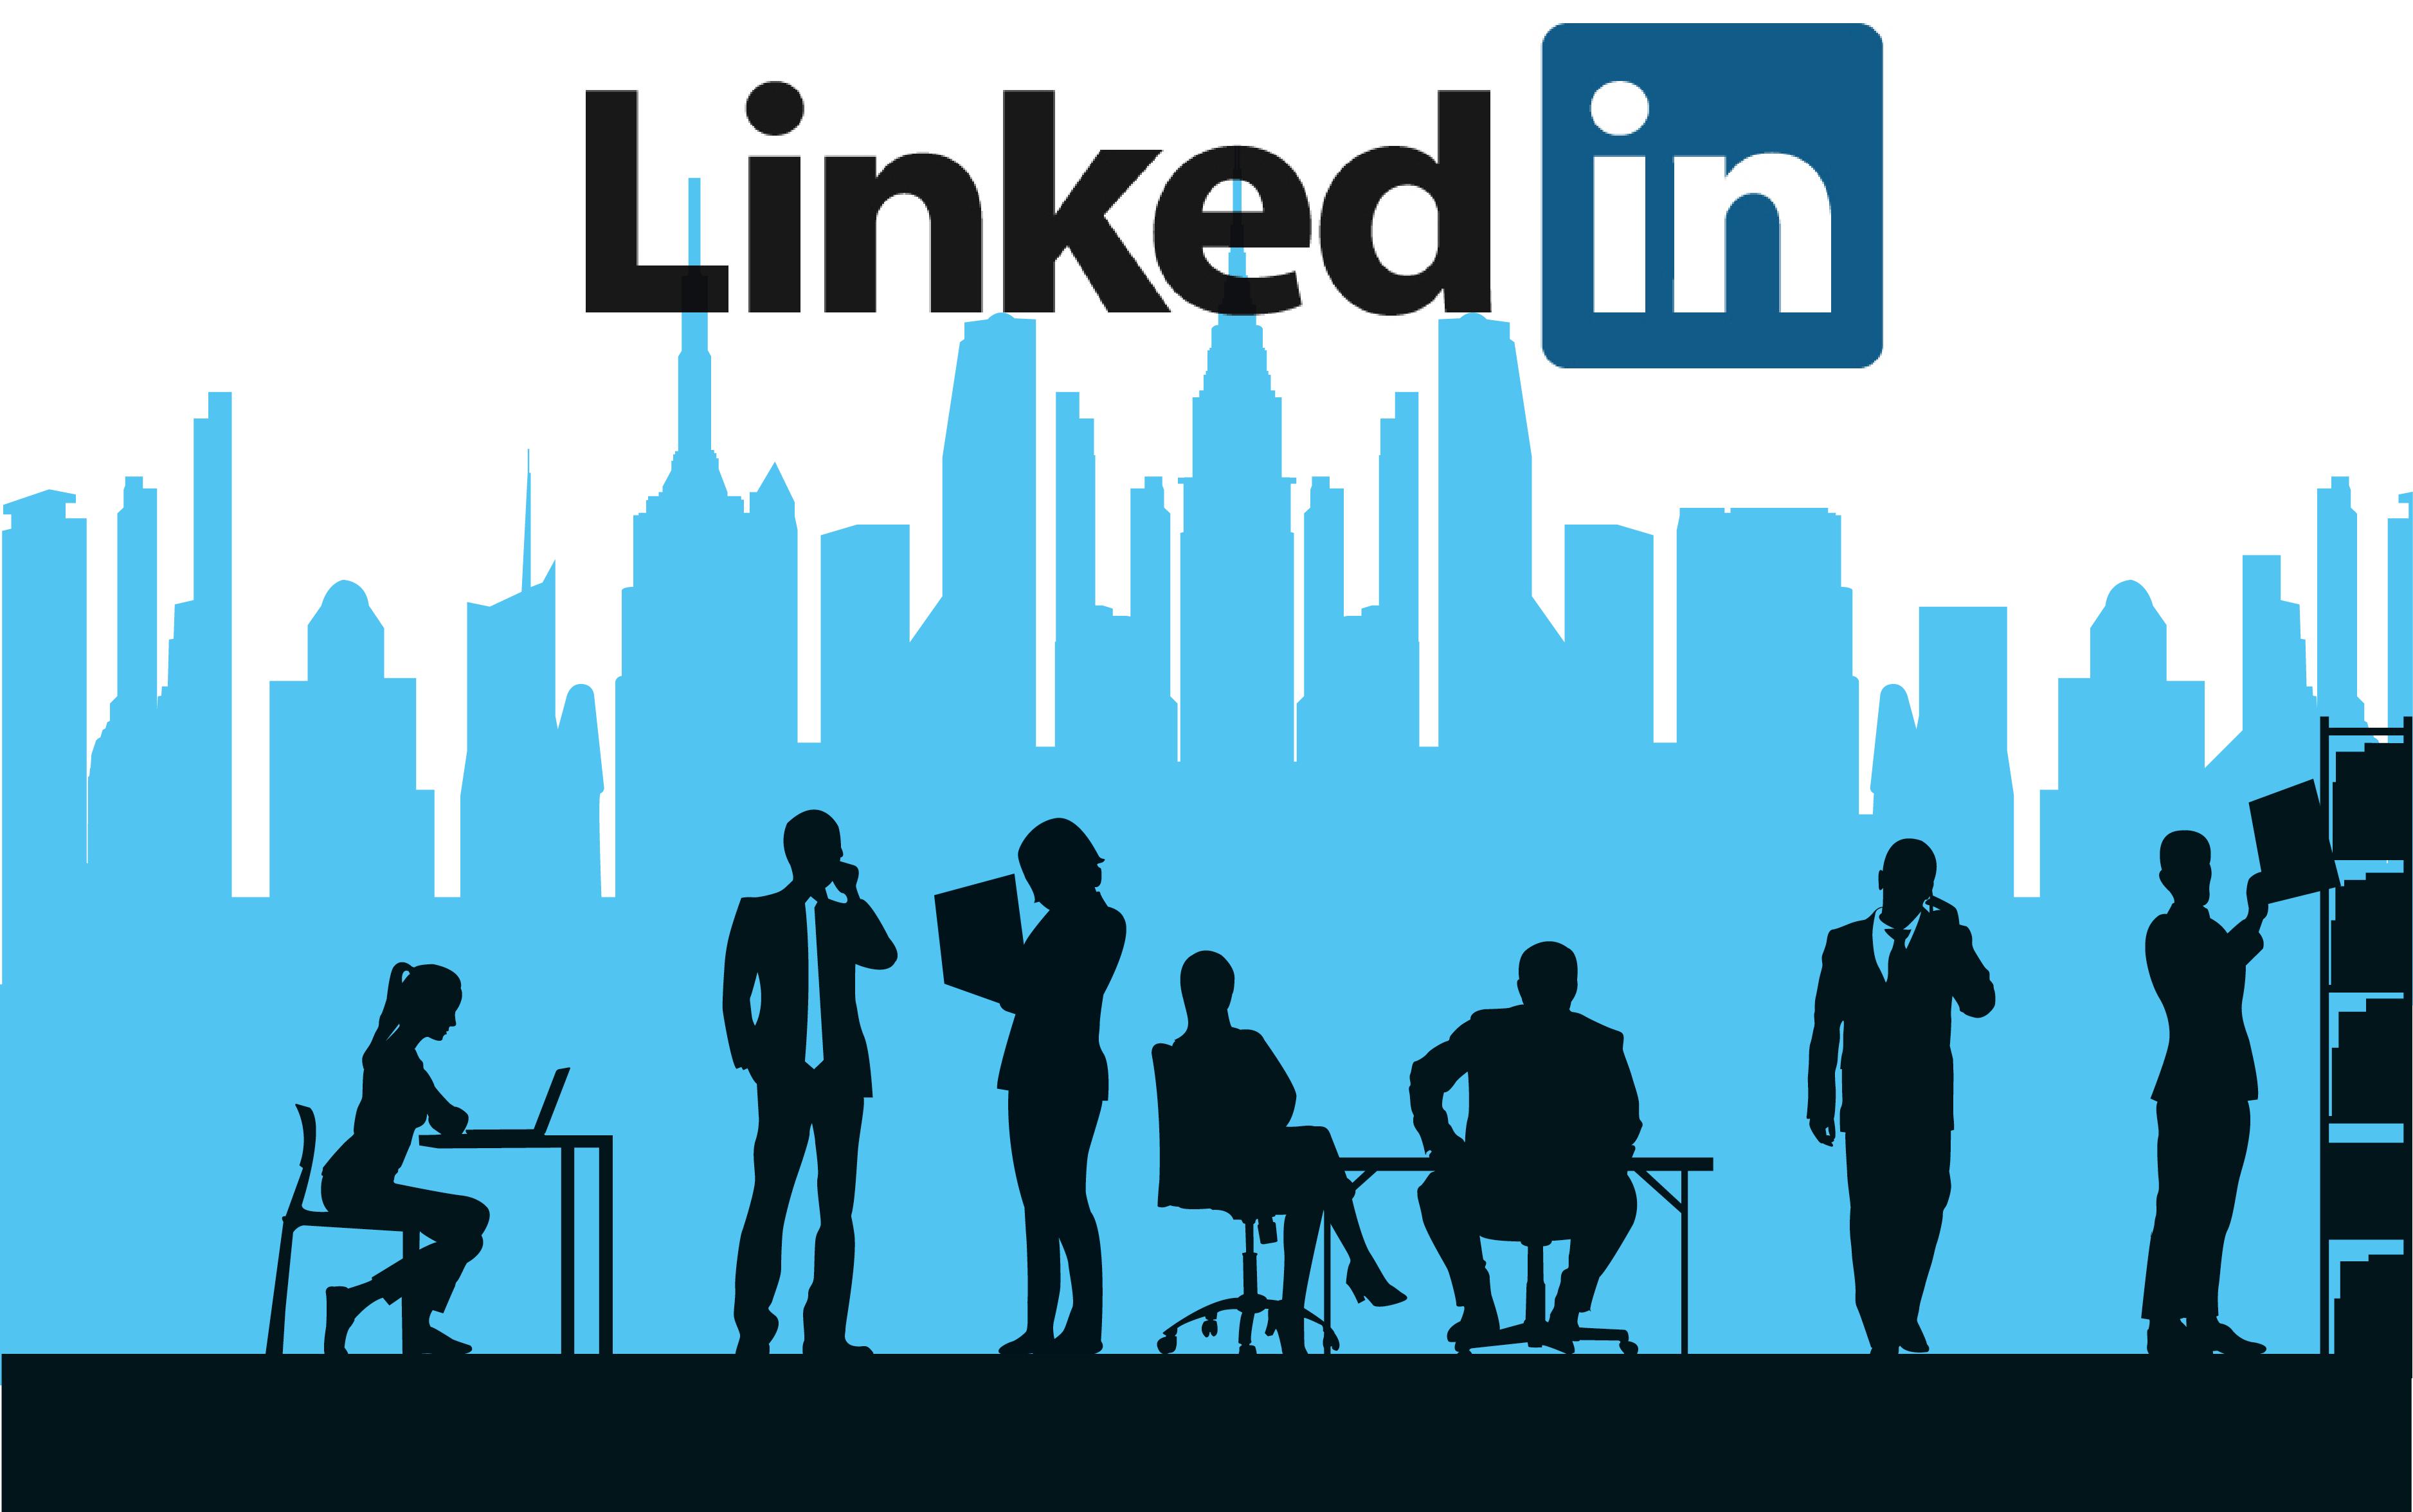 Volg Ontmoetingsclusters Enschede op Linkedin